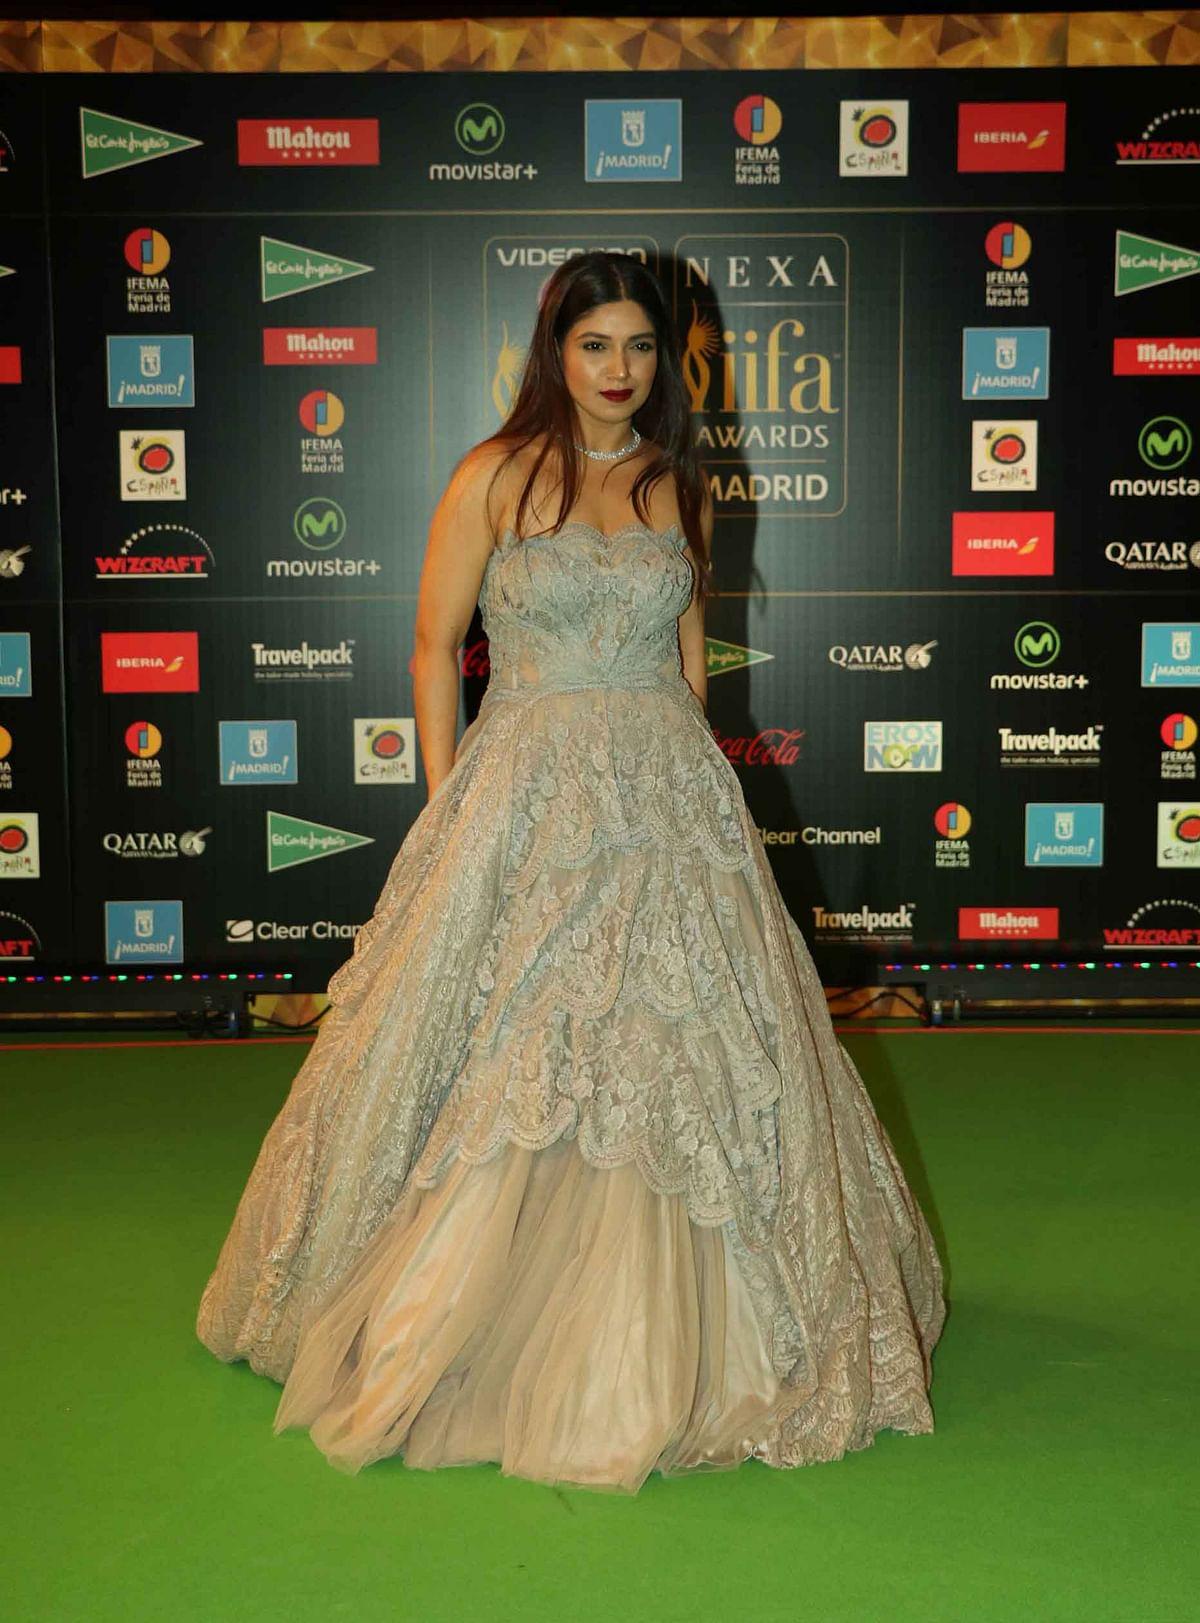 Bollywood actress Bhumi Pednekar poses for photographers at the International Indian Film Academy (IIFA) Rocks Green Carpet (Photo: AP)